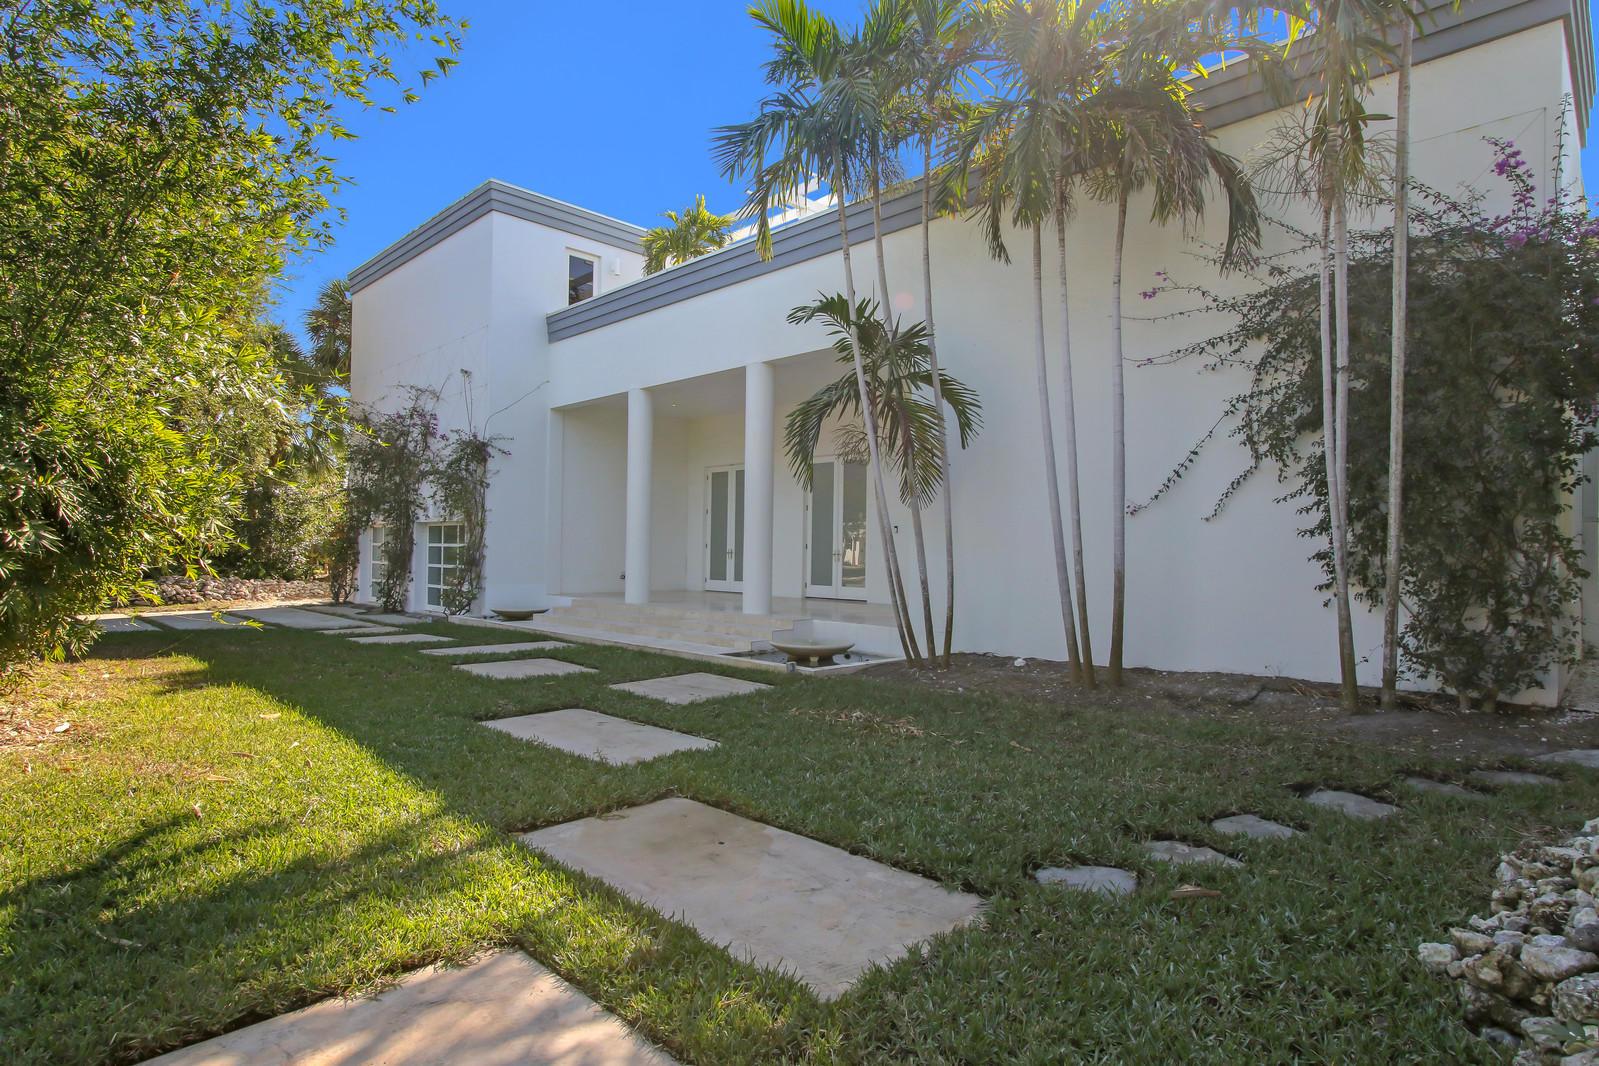 230 Miramar Way, West Palm Beach, Florida 33405, 5 Bedrooms Bedrooms, ,6.1 BathroomsBathrooms,Single Family,For Rent,Miramar,1,RX-10472217